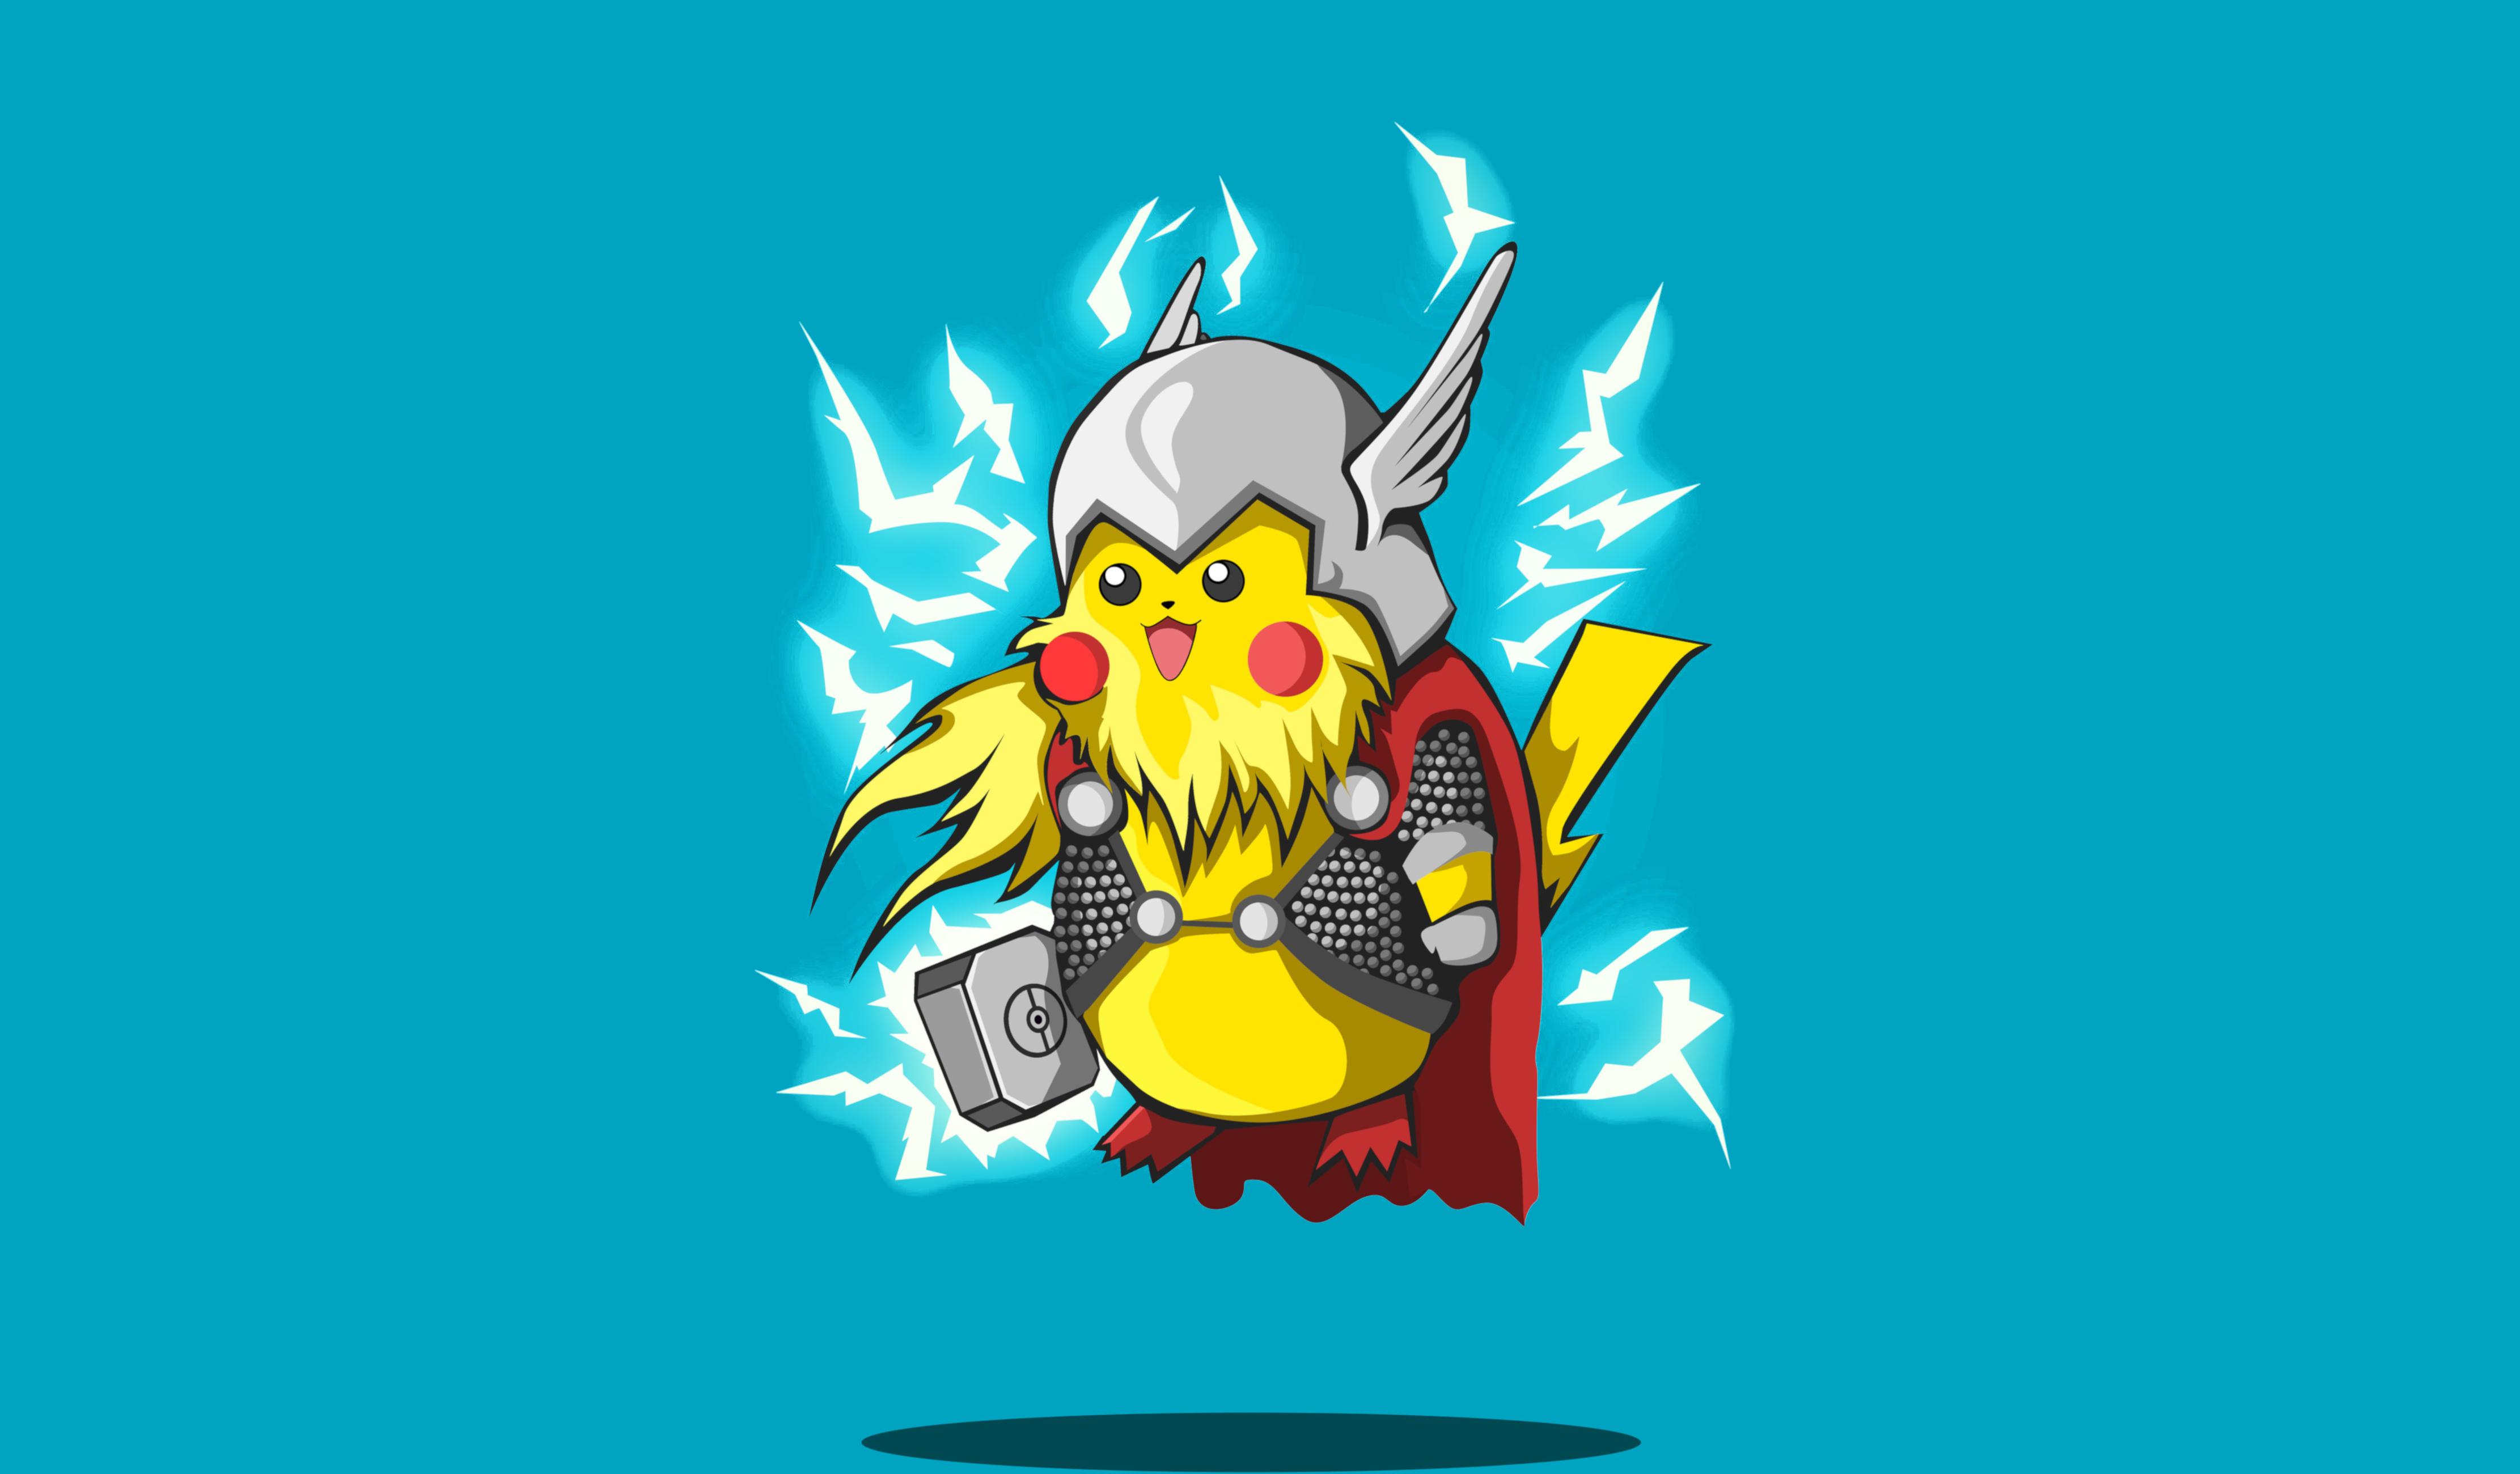 Pikachu 4k Ultra Hd Wallpaper Background Image 4445x2600 Id